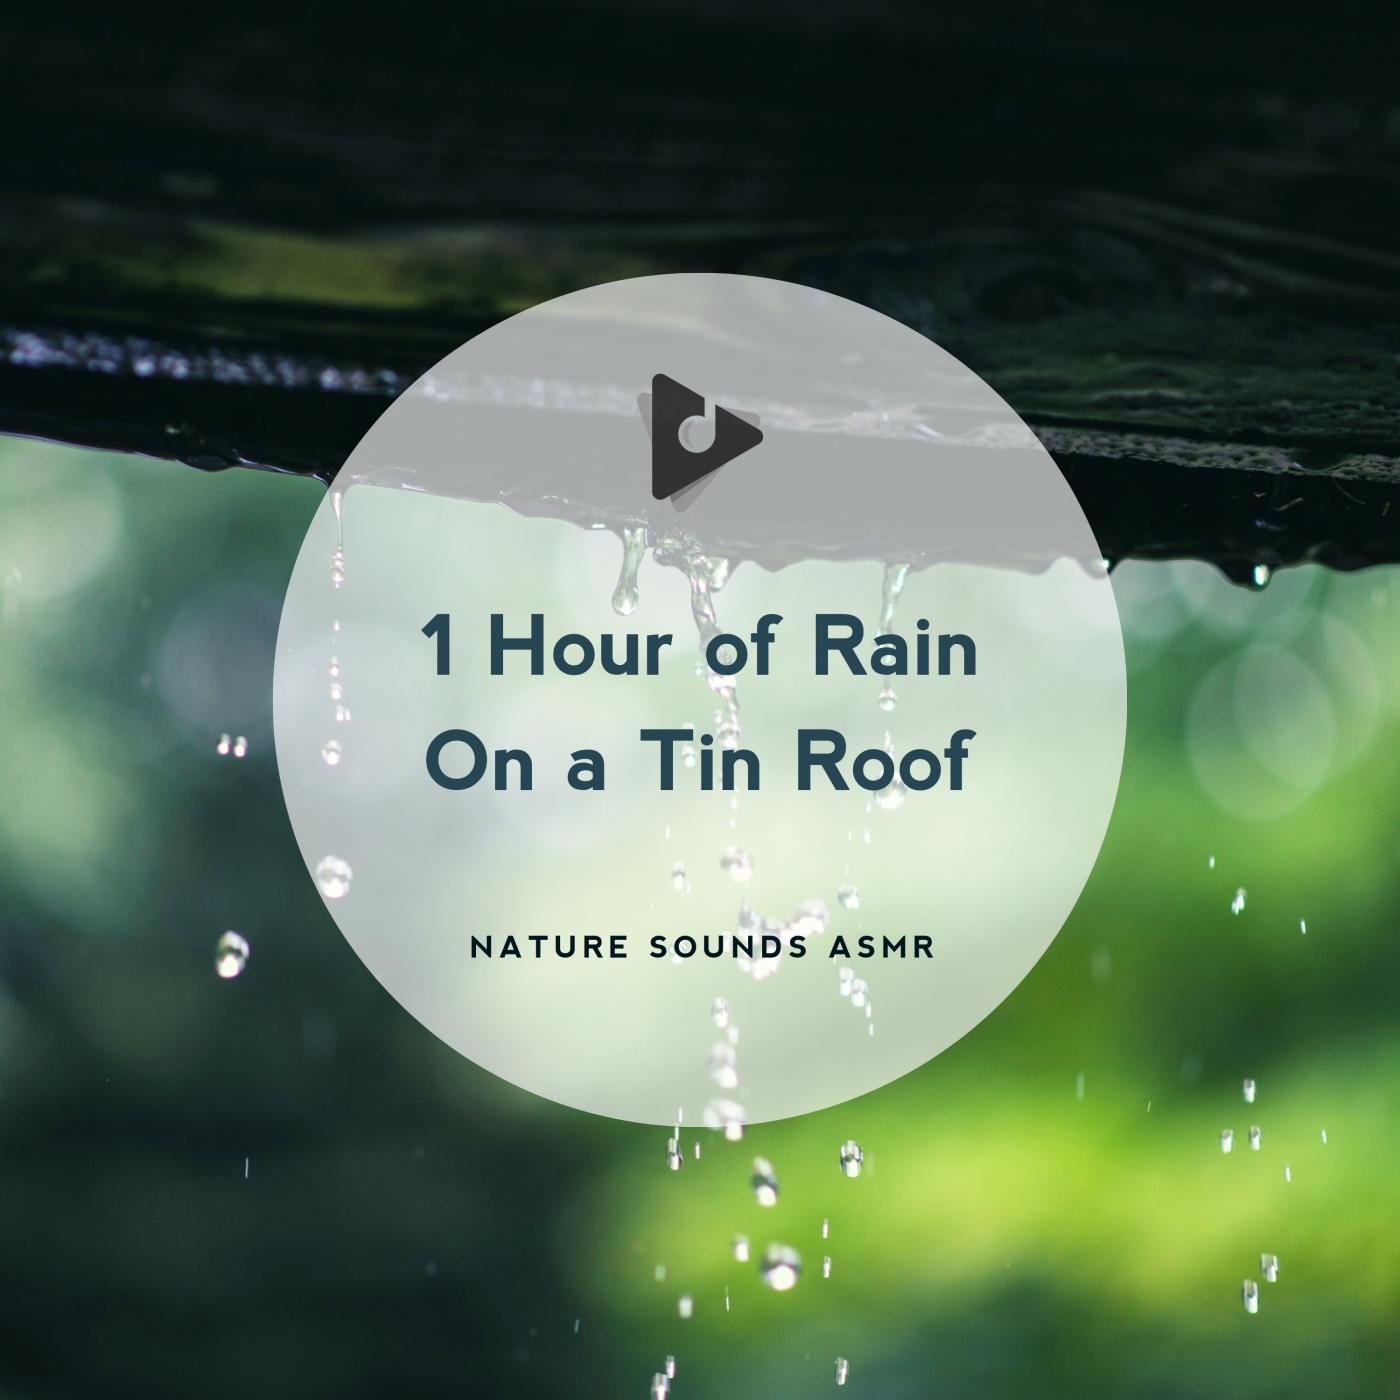 1 Hour of Rain On a Tin Roof